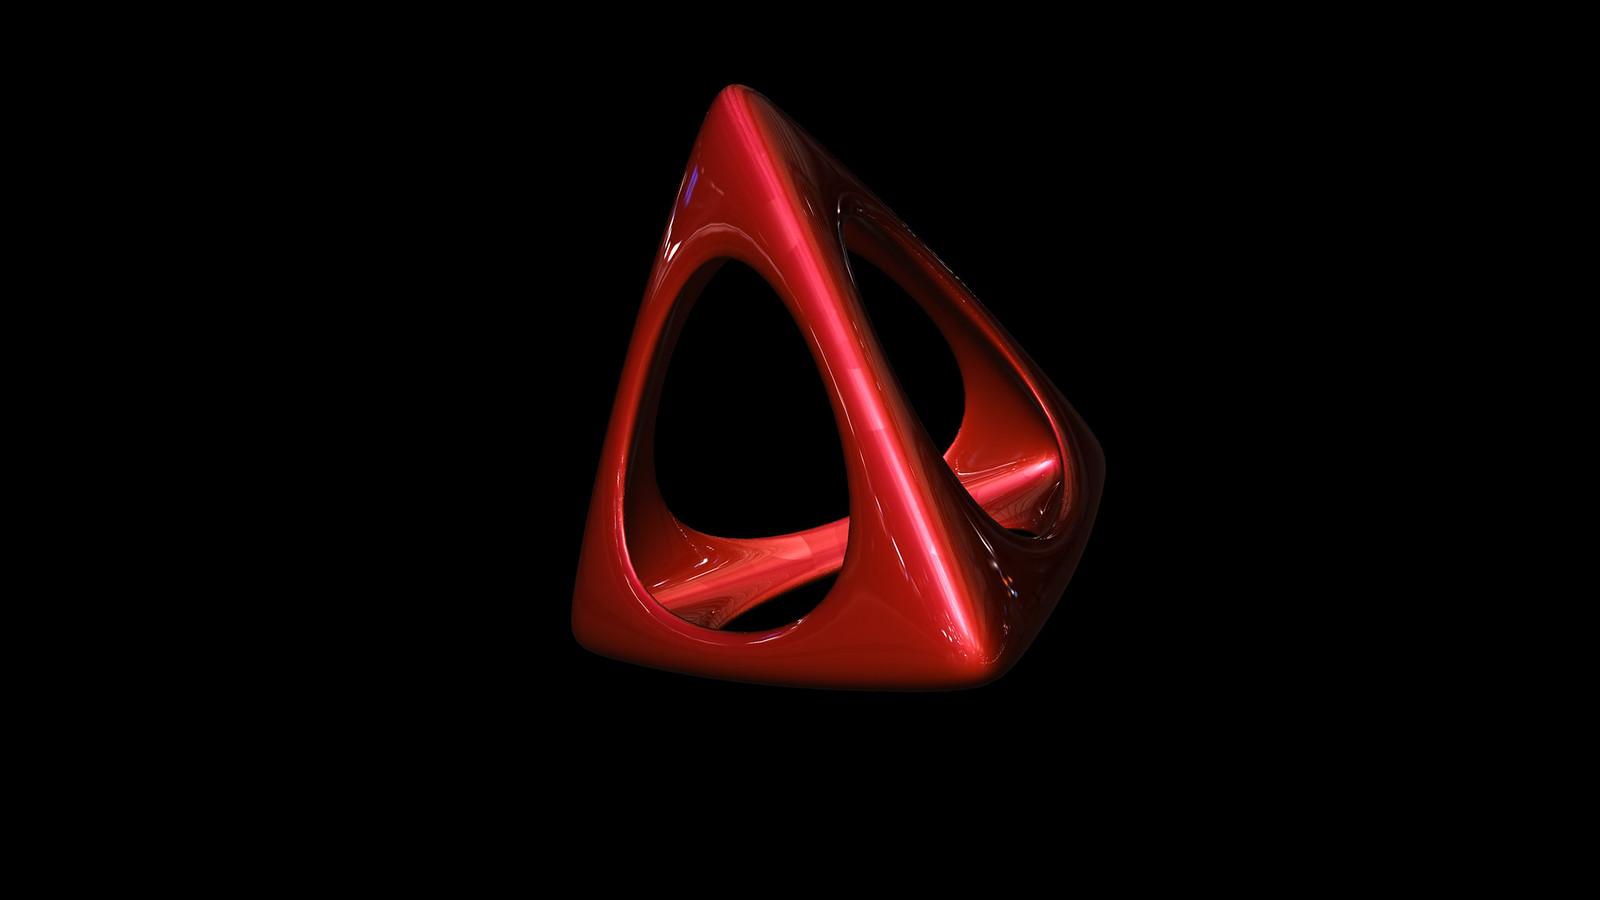 tetrahedron soft